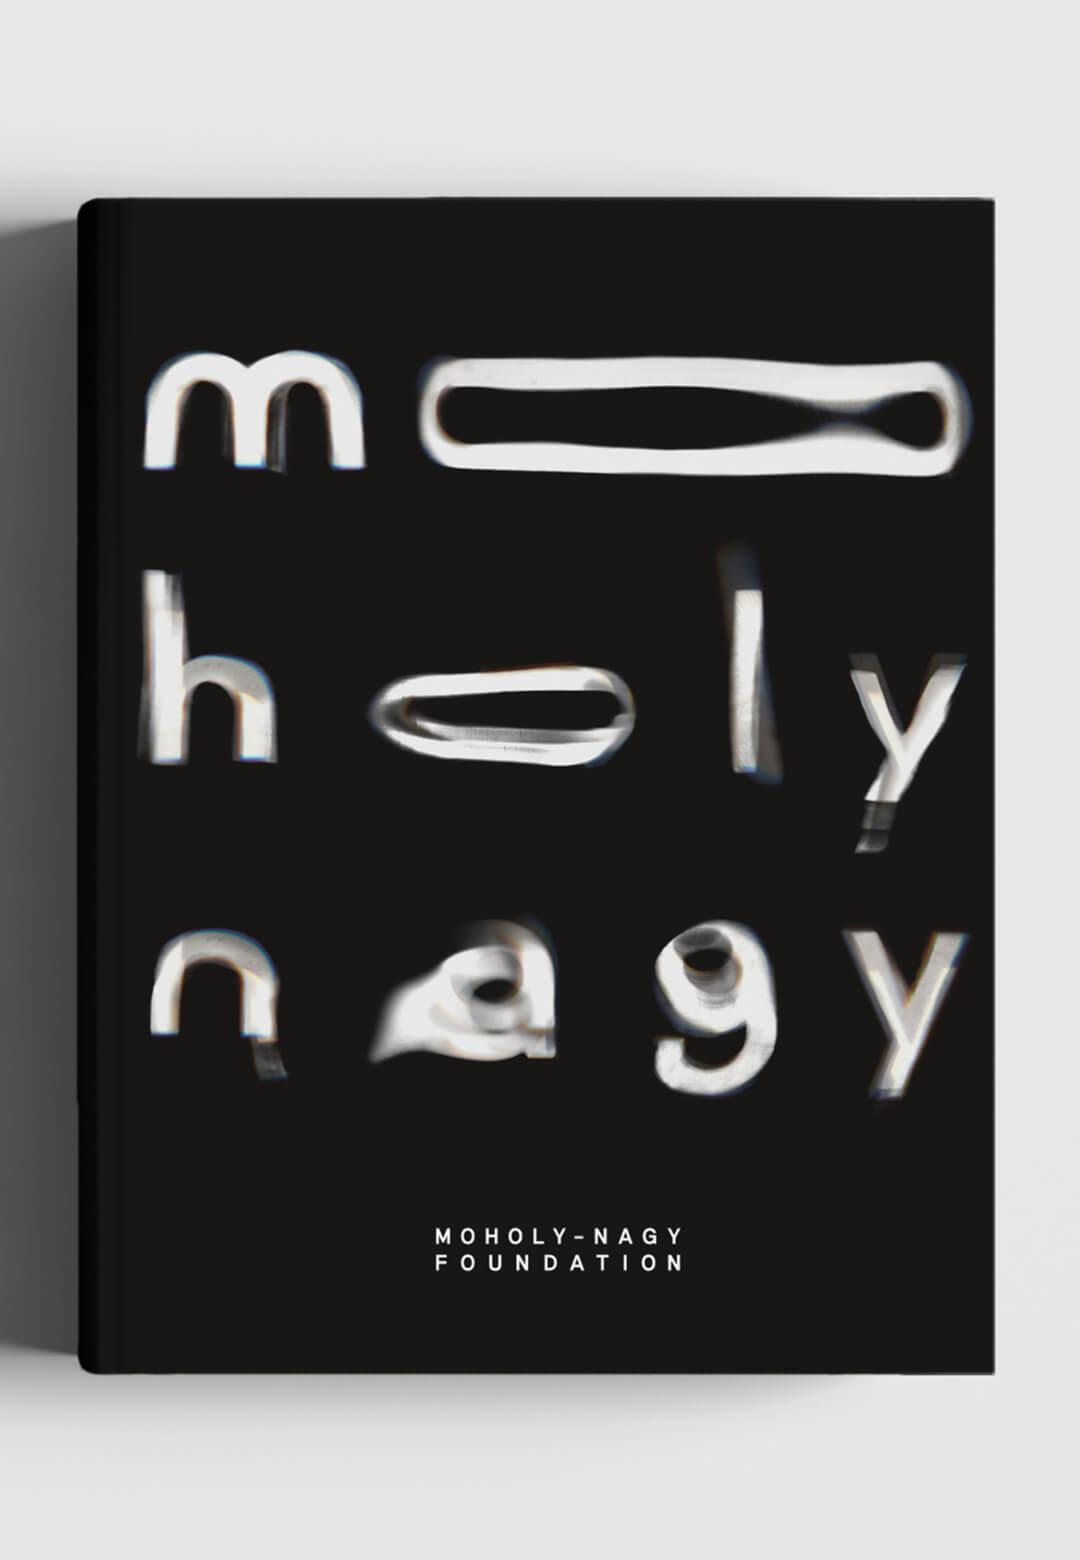 The new branding for Moholy-Nagy Foundation designed by Pentagram | Moholy-Nagy Foundation | Pentagram | STIRworld